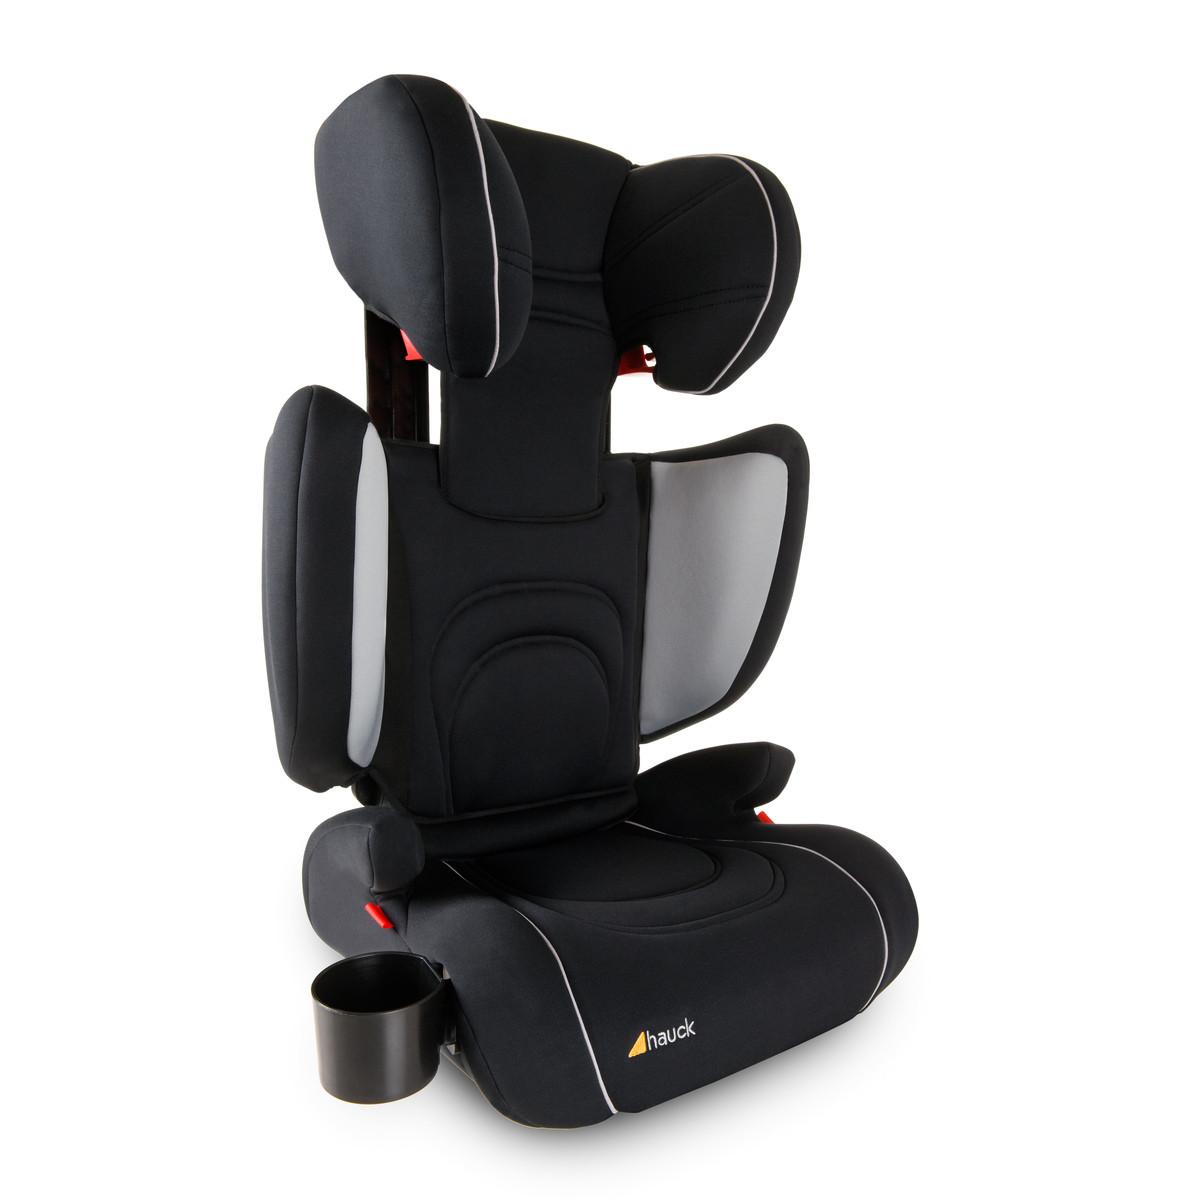 Siège-Auto Bodyguard Pro